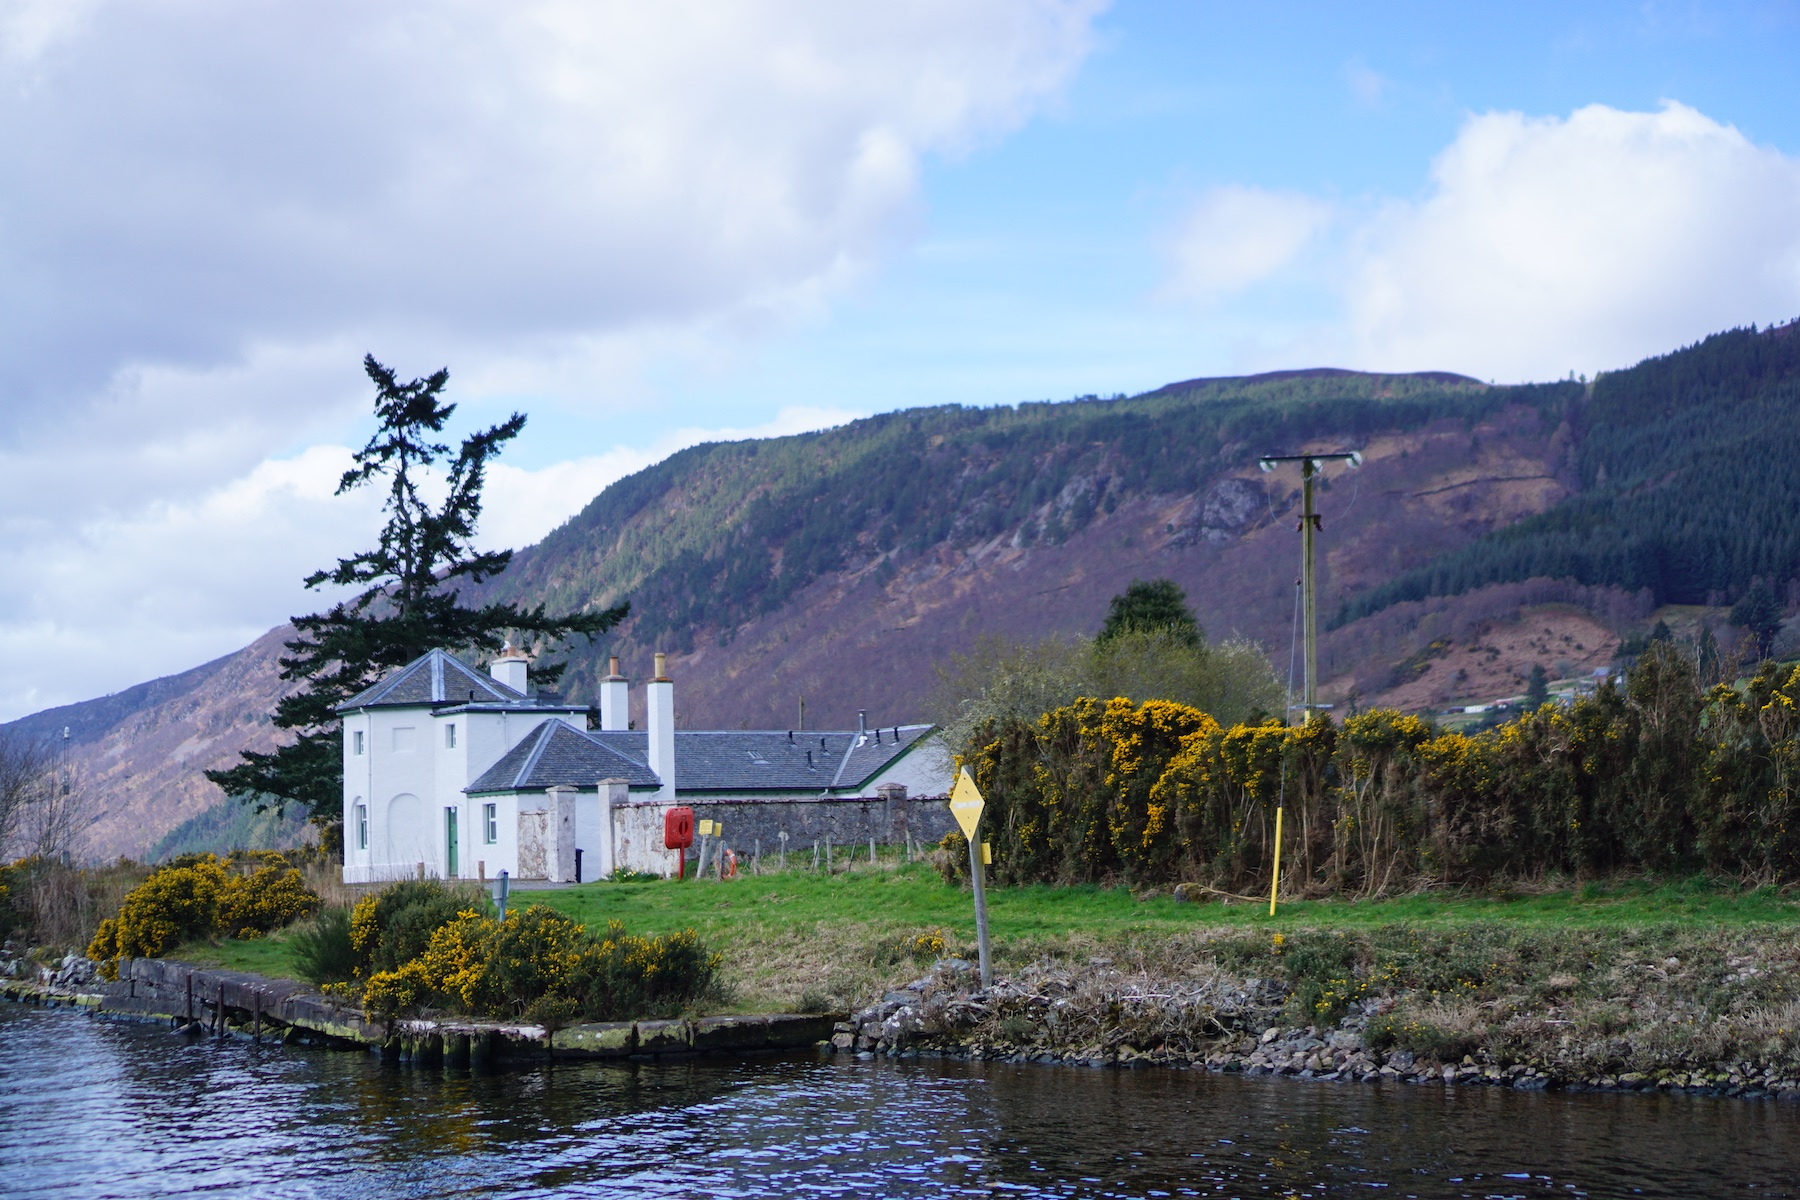 Loch Ness, Scotland